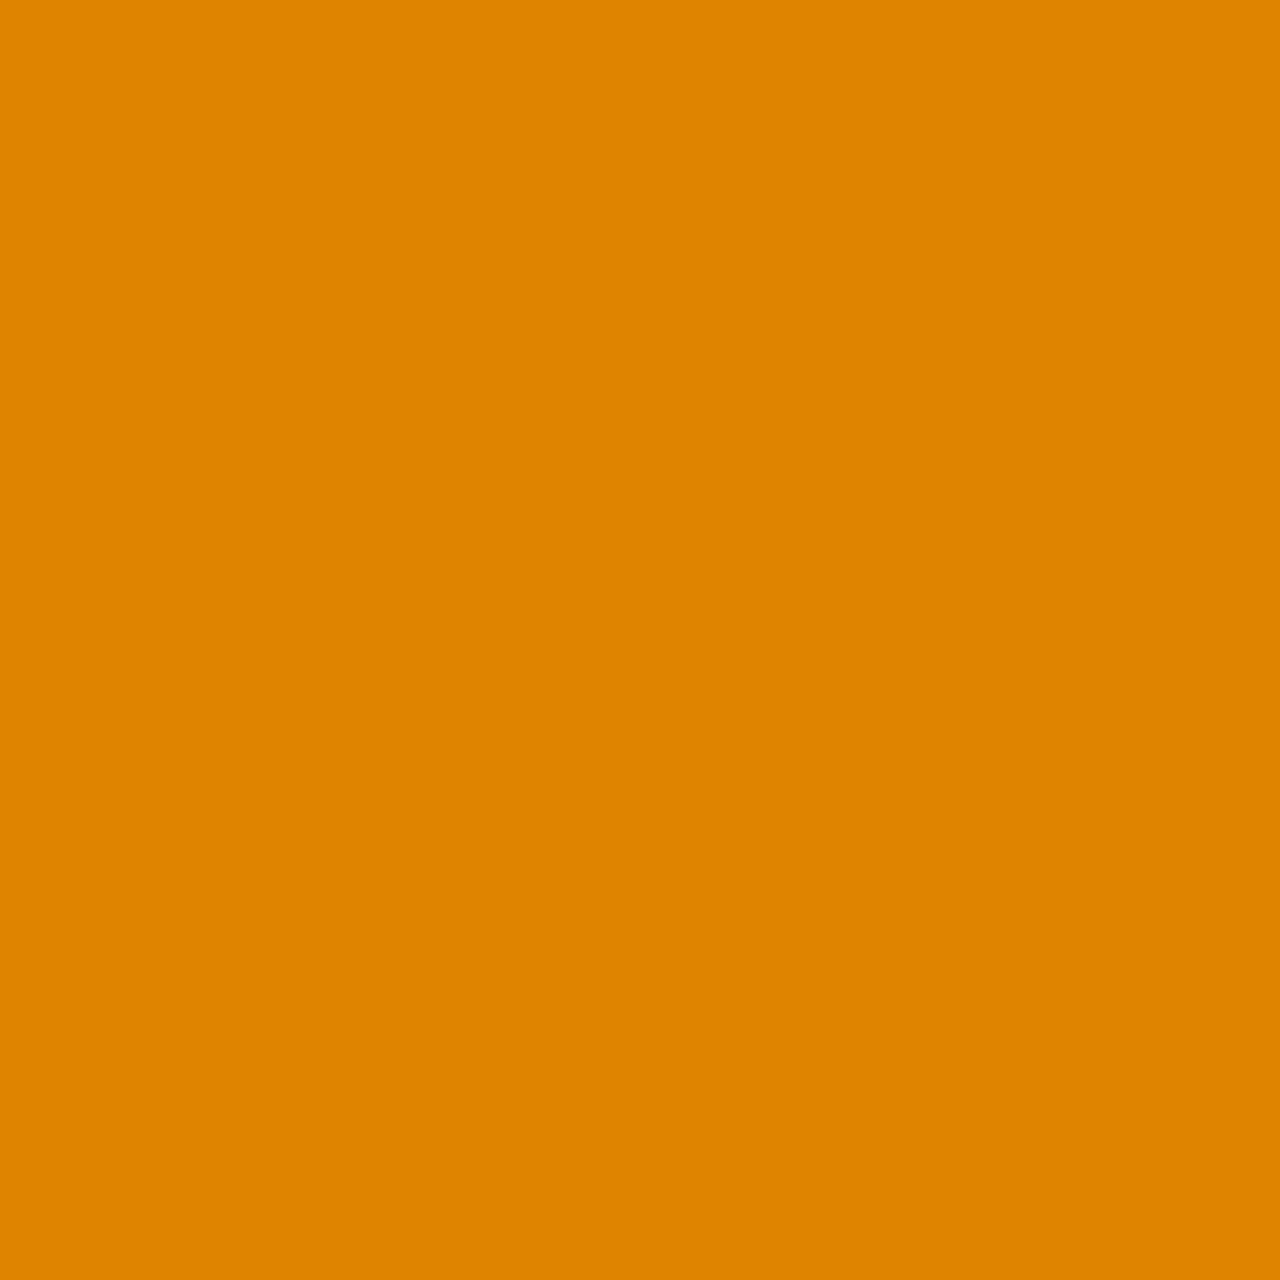 Rosco Cinegel Sheet #3102: Tough MT2, Gels